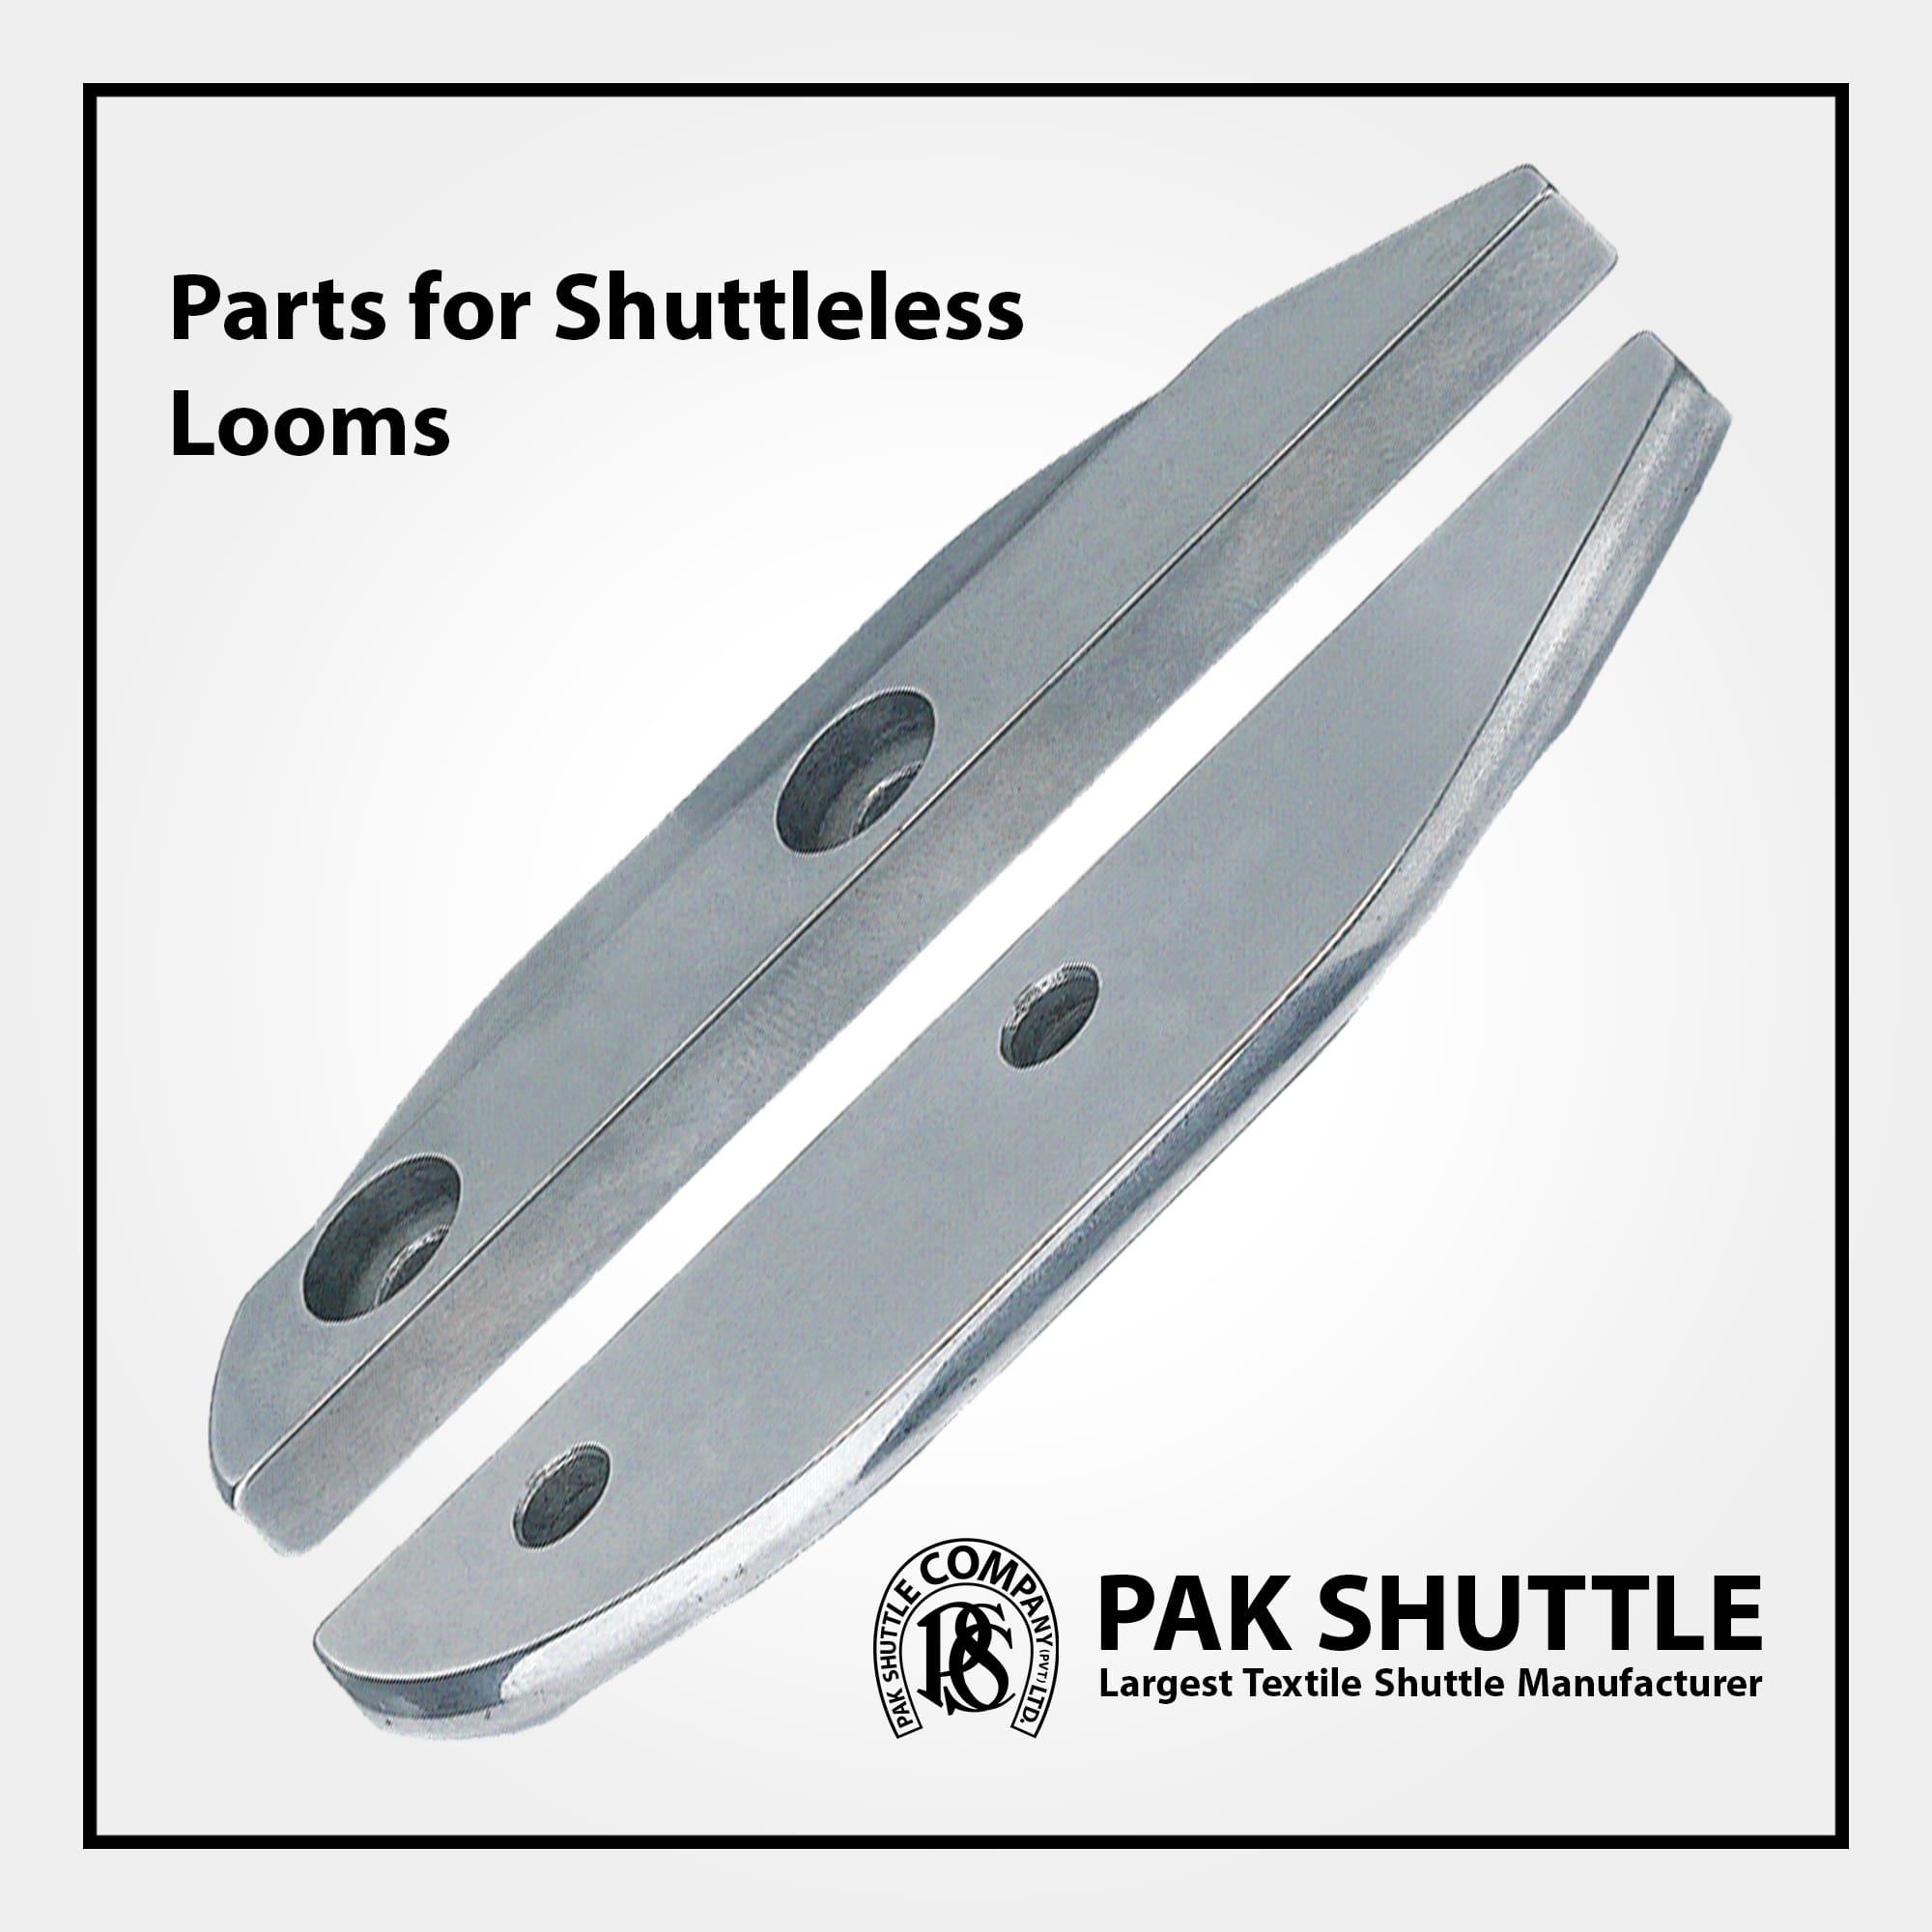 Shuttleless Loom Parts by Pak Shuttle Company Pvt Ltd.